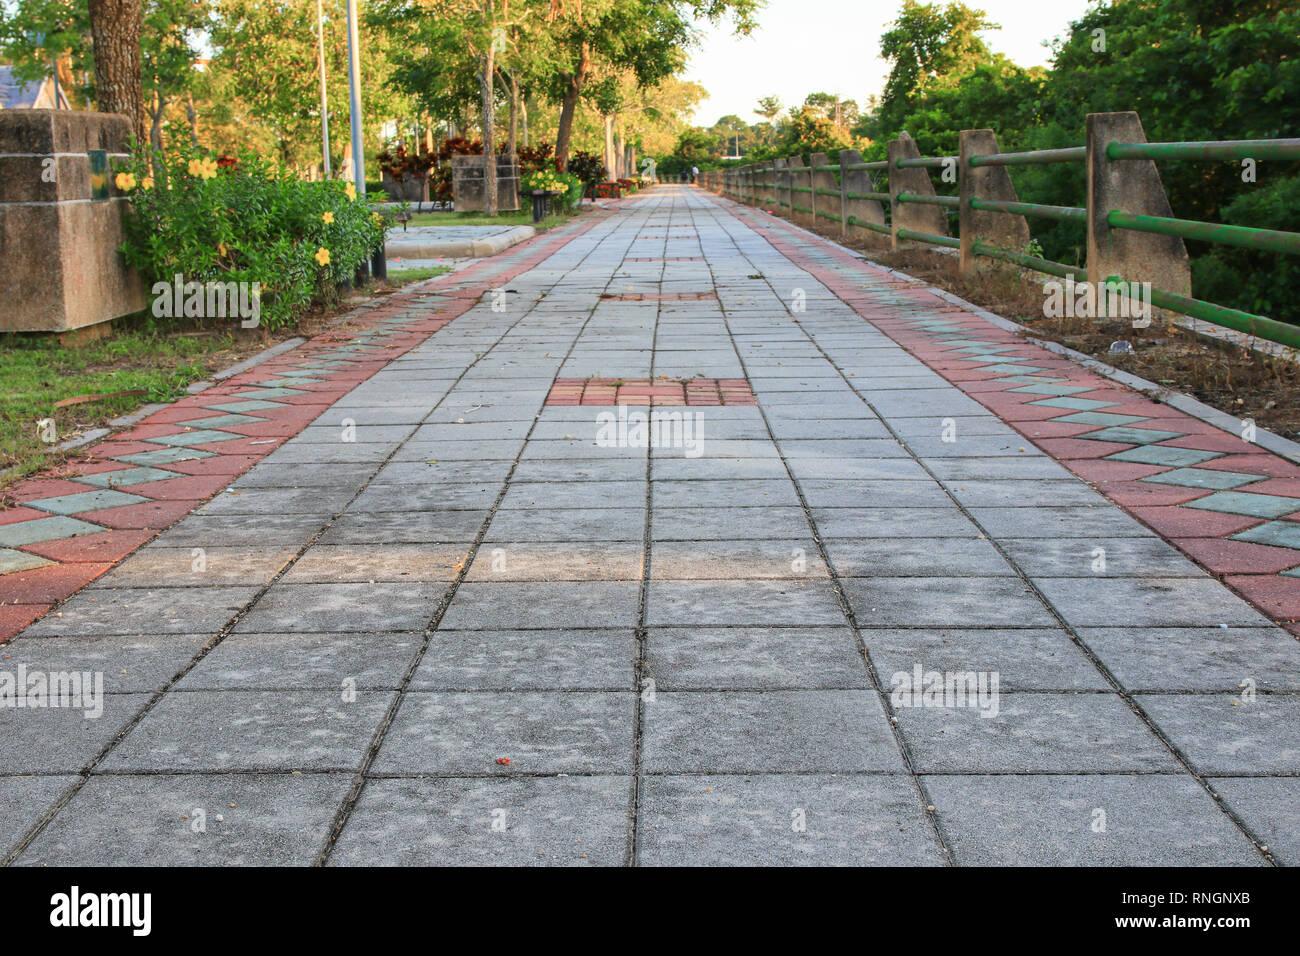 Blue Cement Coloring Walkways | www.tollebild.com